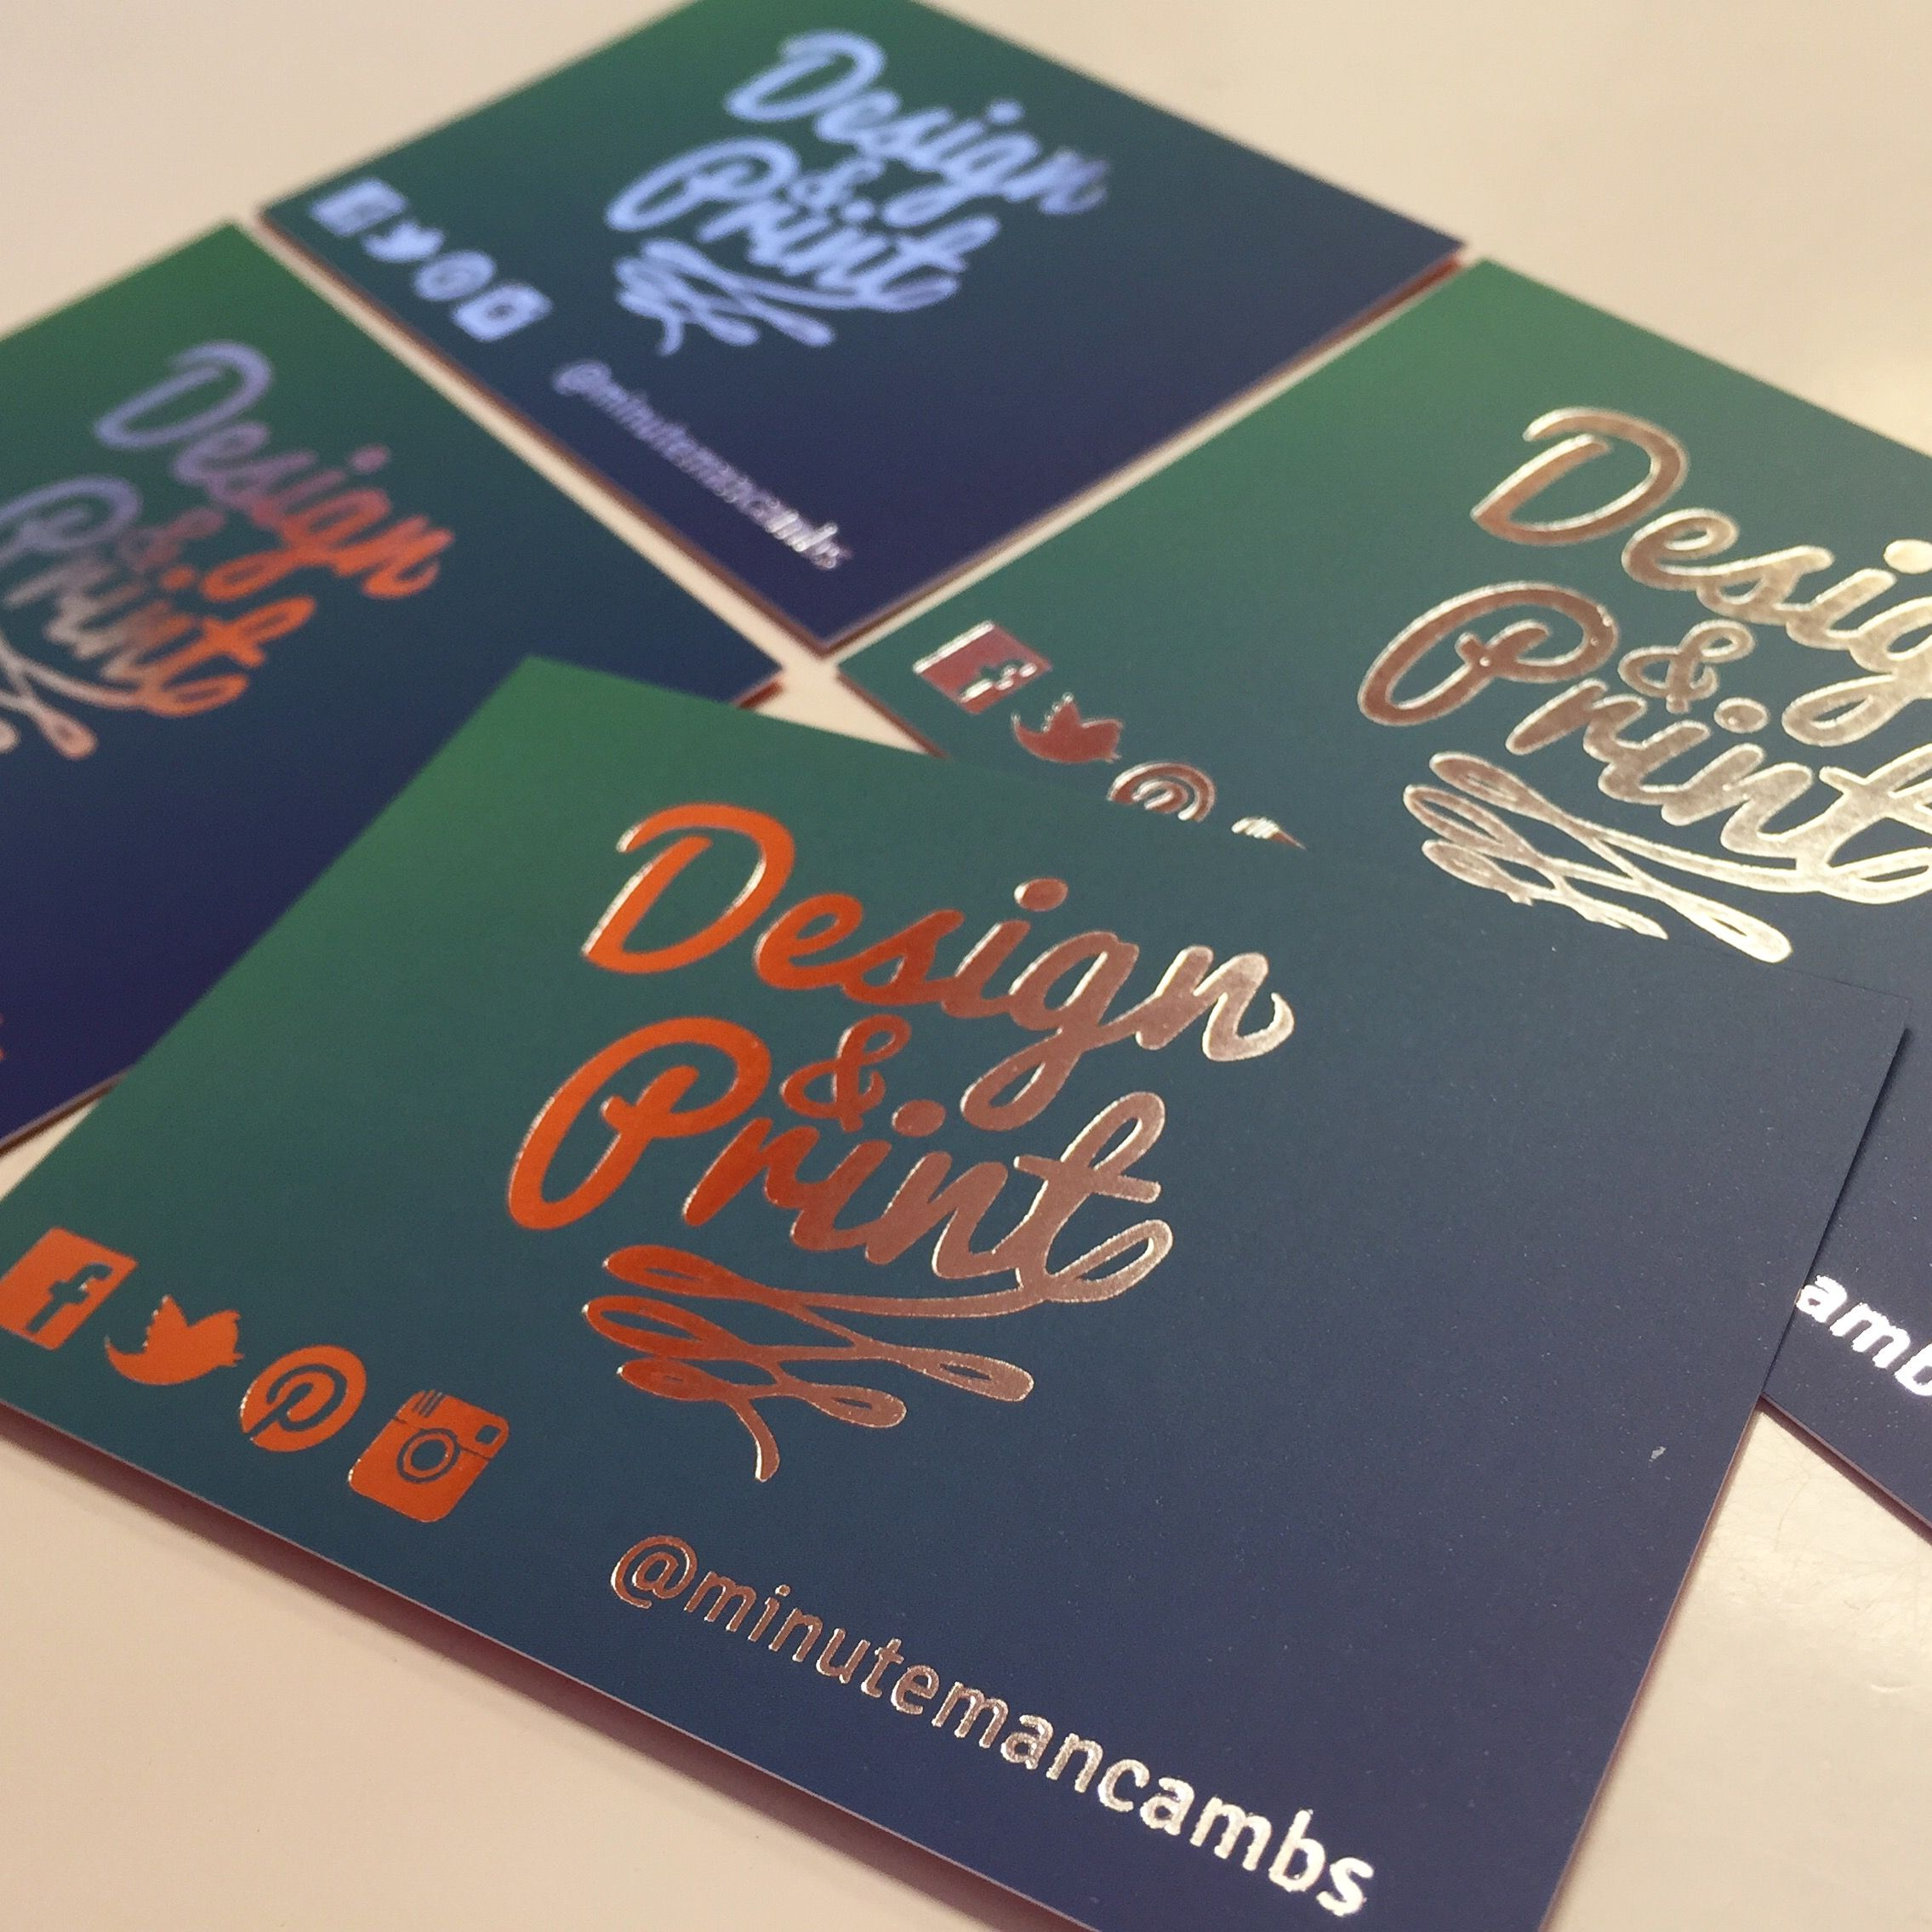 Digital Foiling Silver Foil Graphic Designer Business Cards For Minuteman Press Graphic Design Business Card Business Card Design Examples Of Business Cards